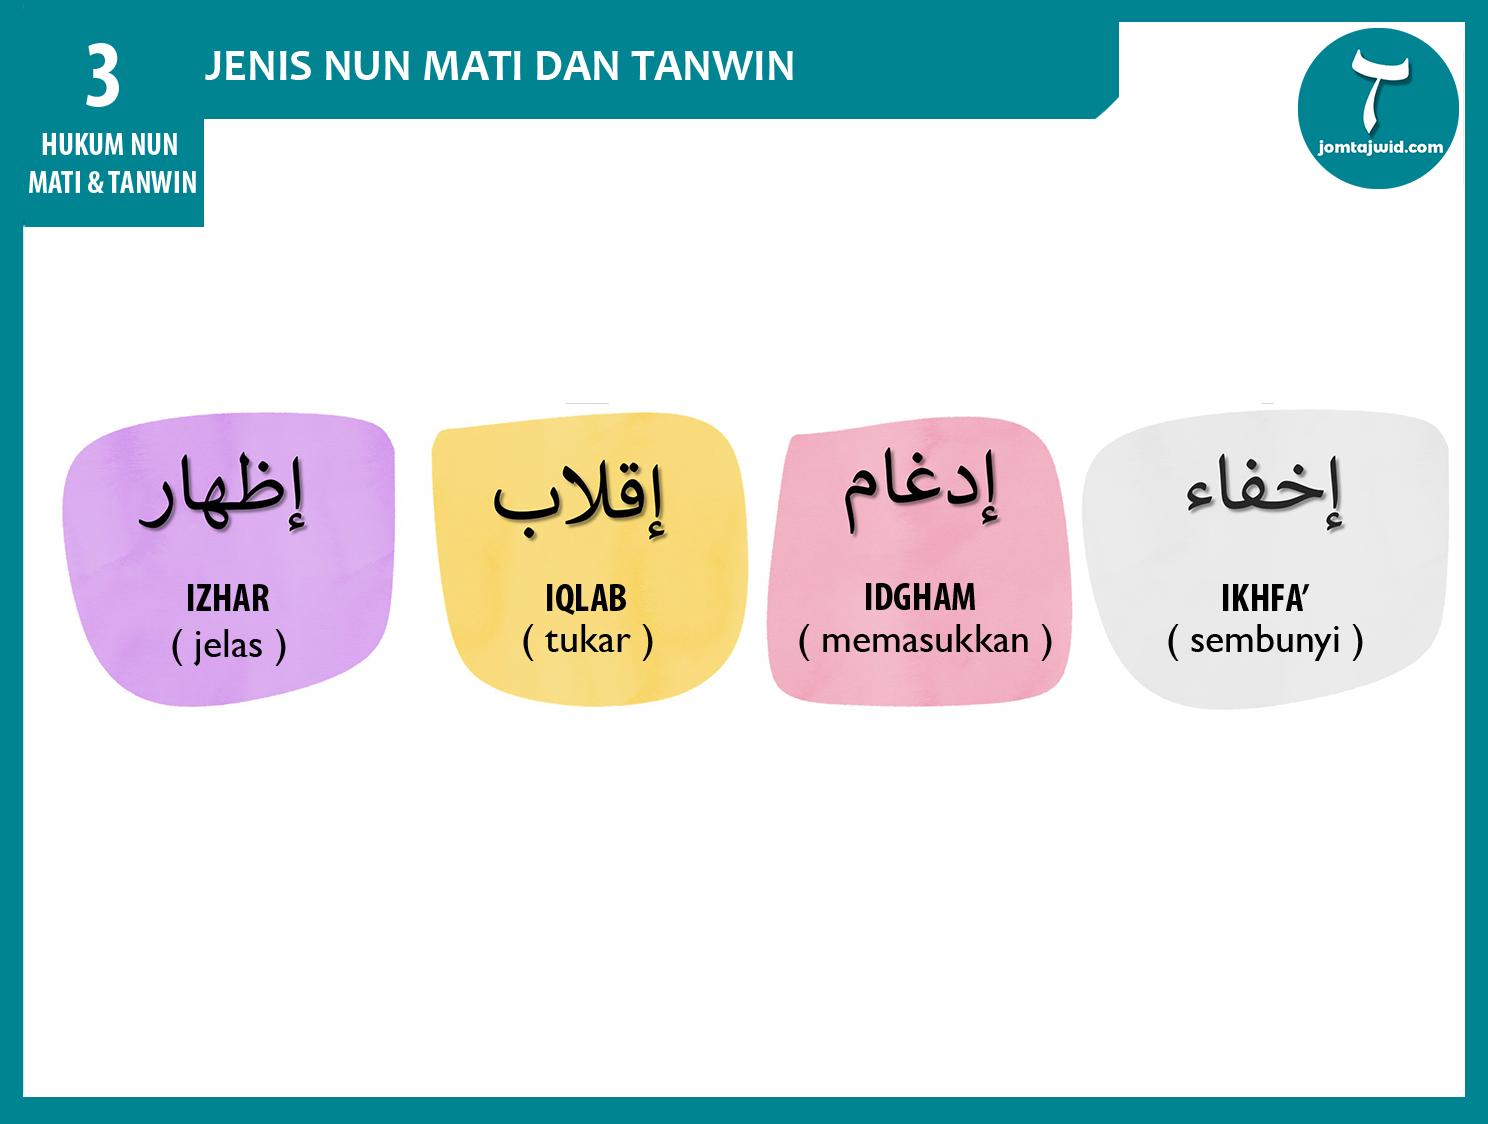 JomTajwid -Hukum Nun Mati Dan Tanwin 1 (Feature)